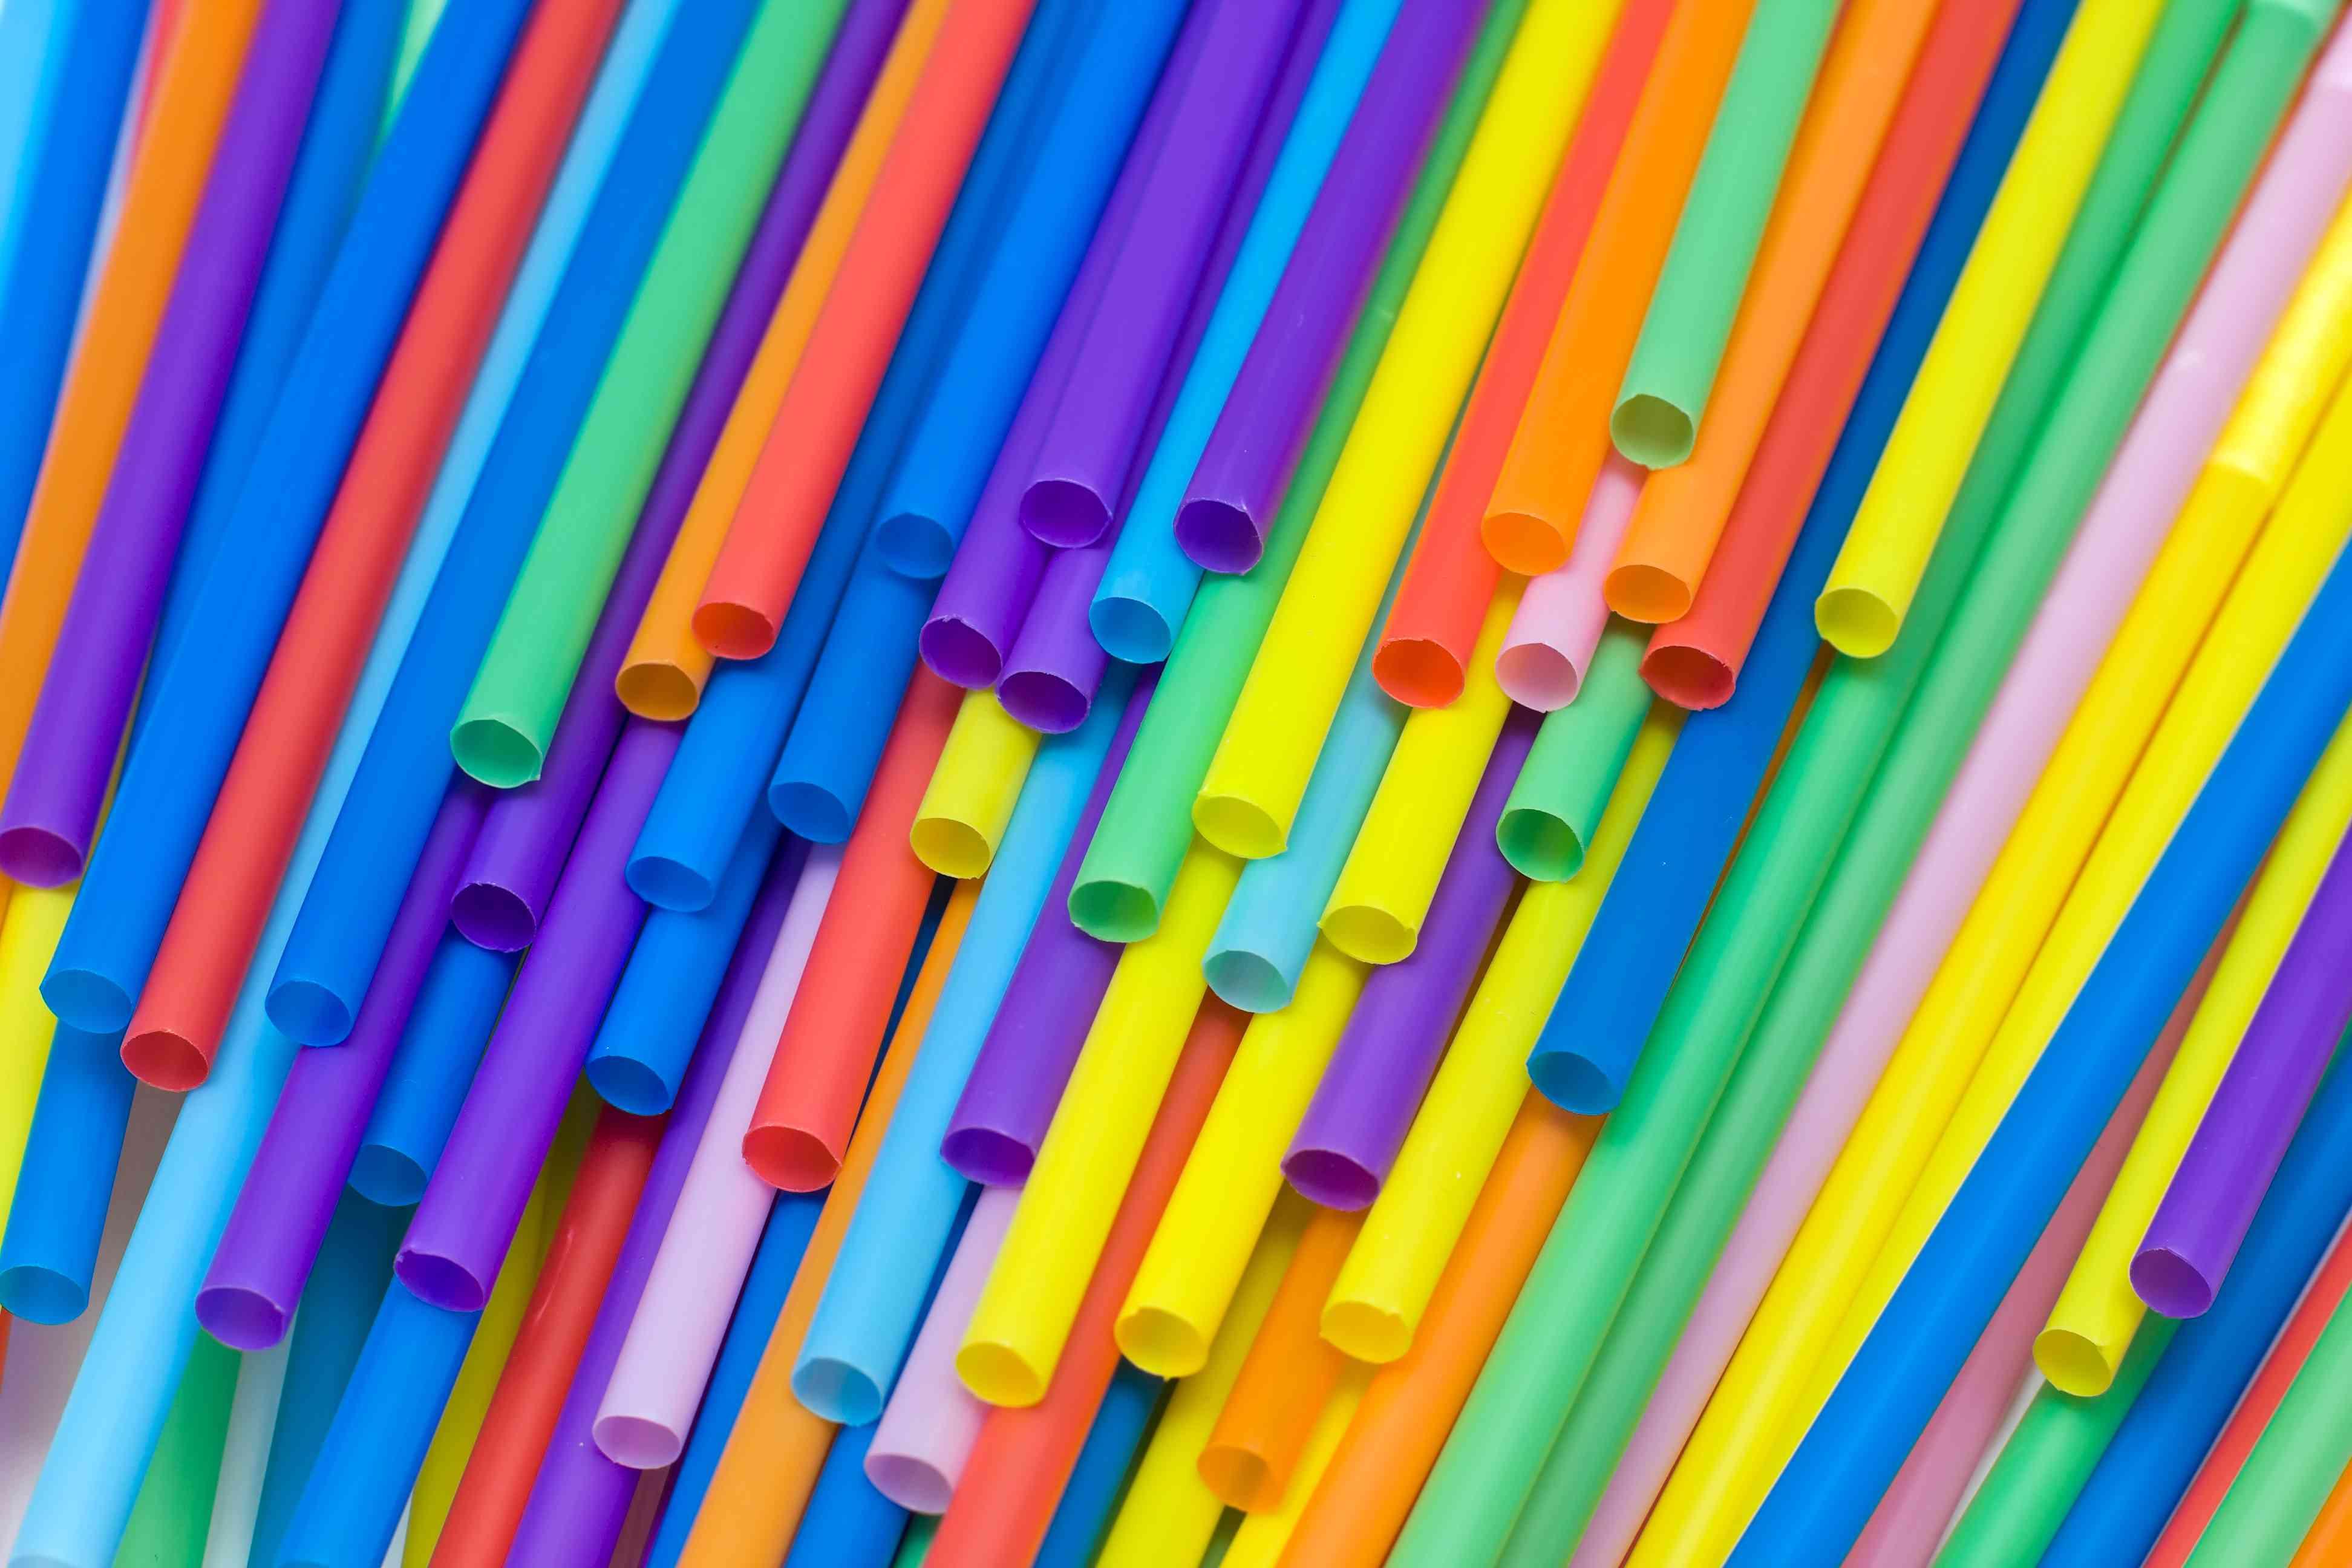 colored plastic drinking straws